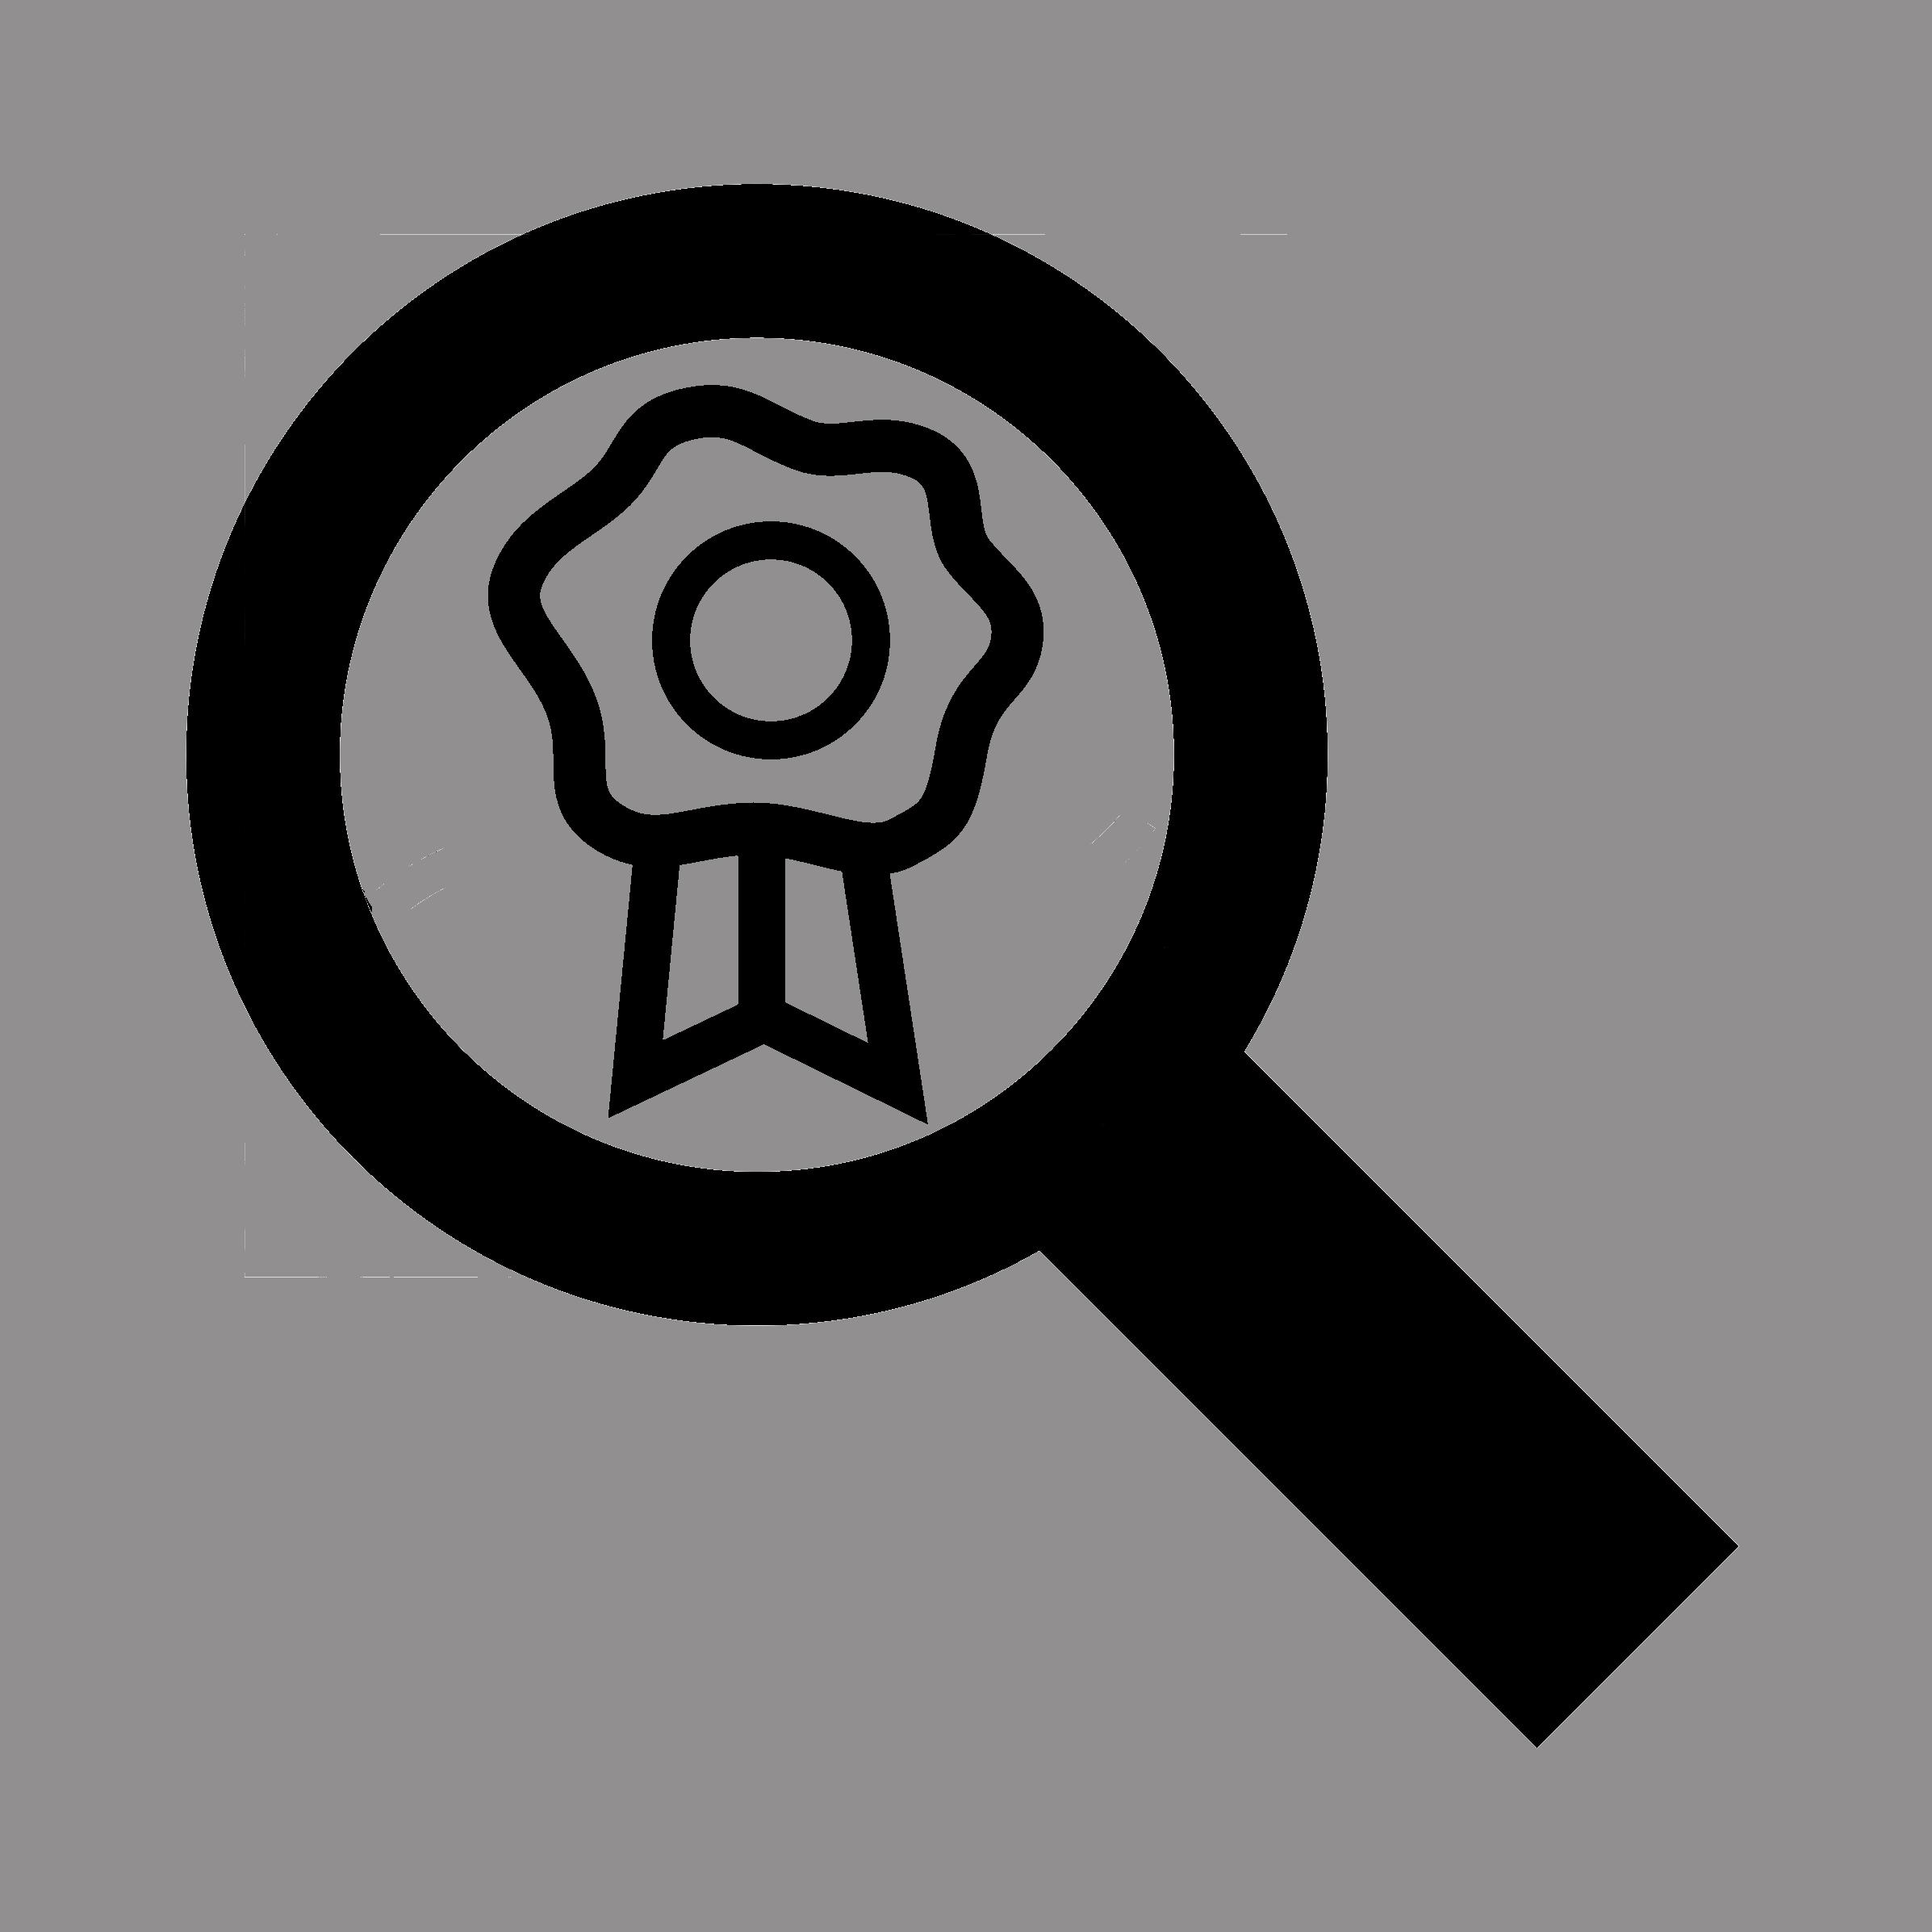 licium-search-engine